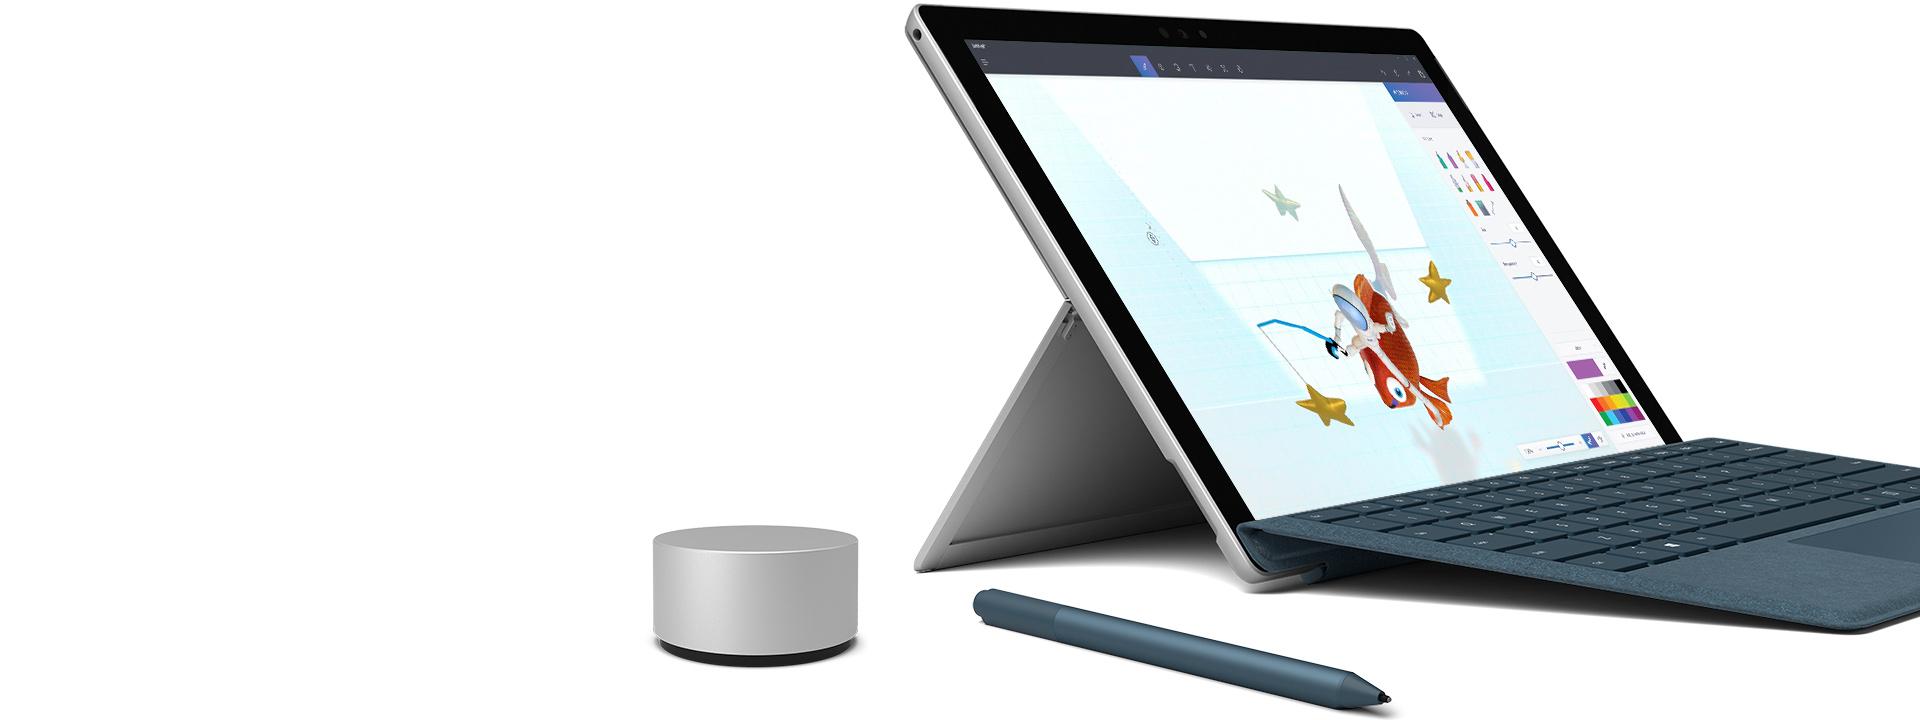 Surface Pro im Laptop-Modus mit Surface Dial, -Stift und Type Cover.